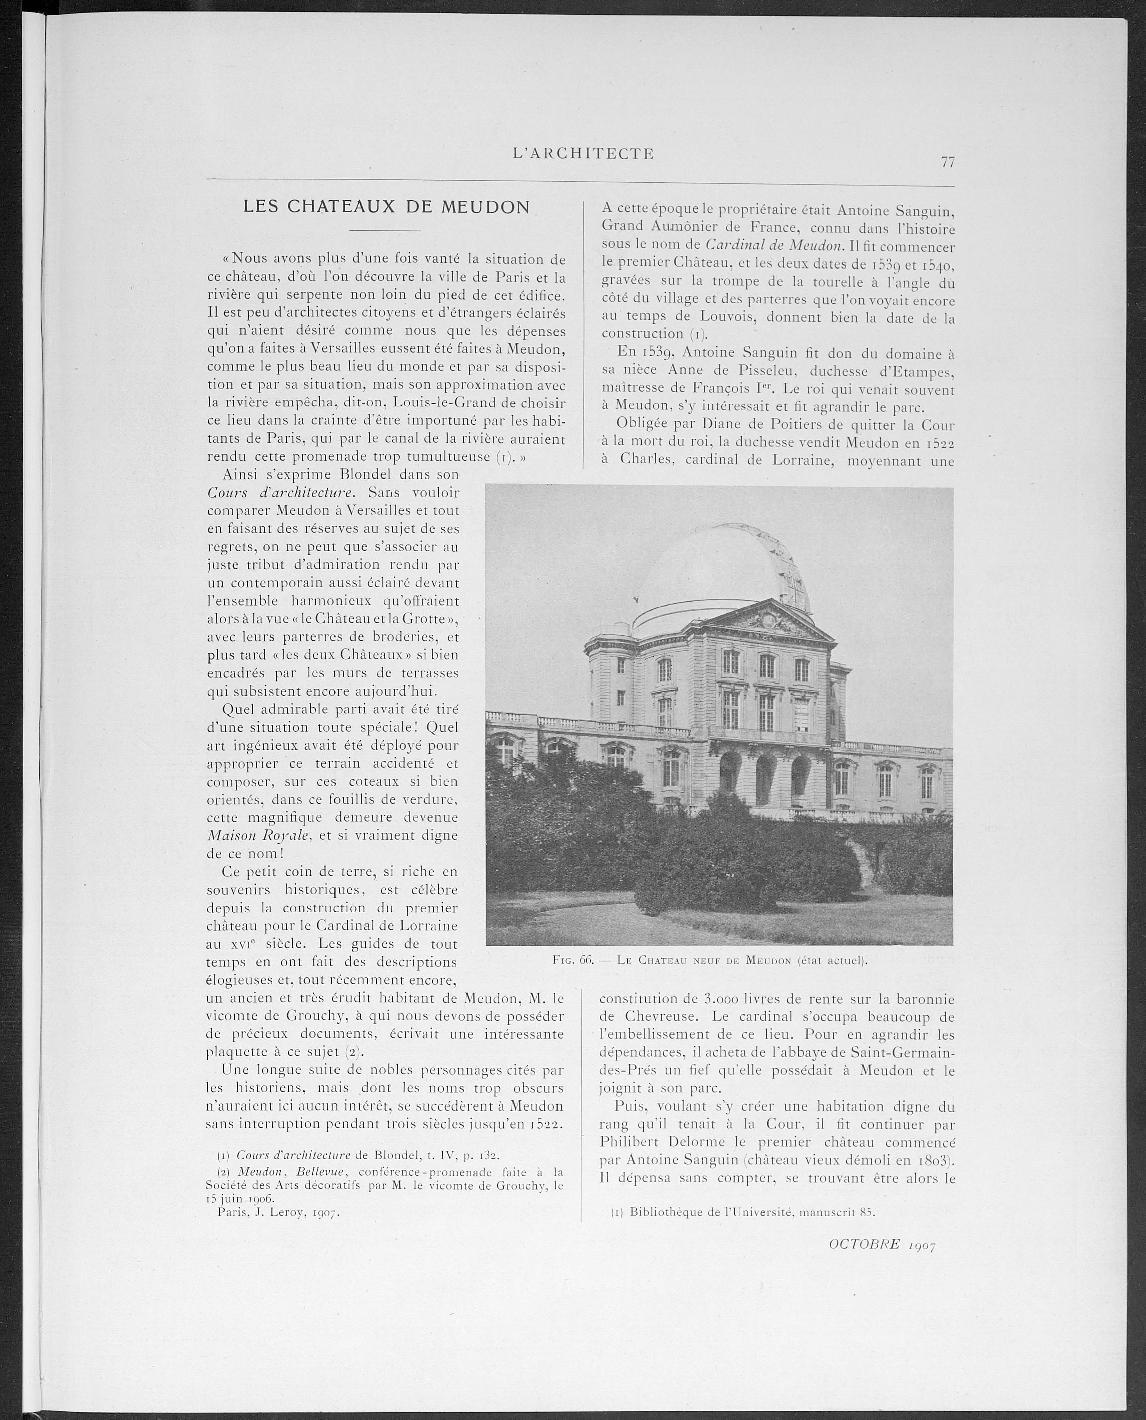 L'Architecte, no. 10, 1907 |